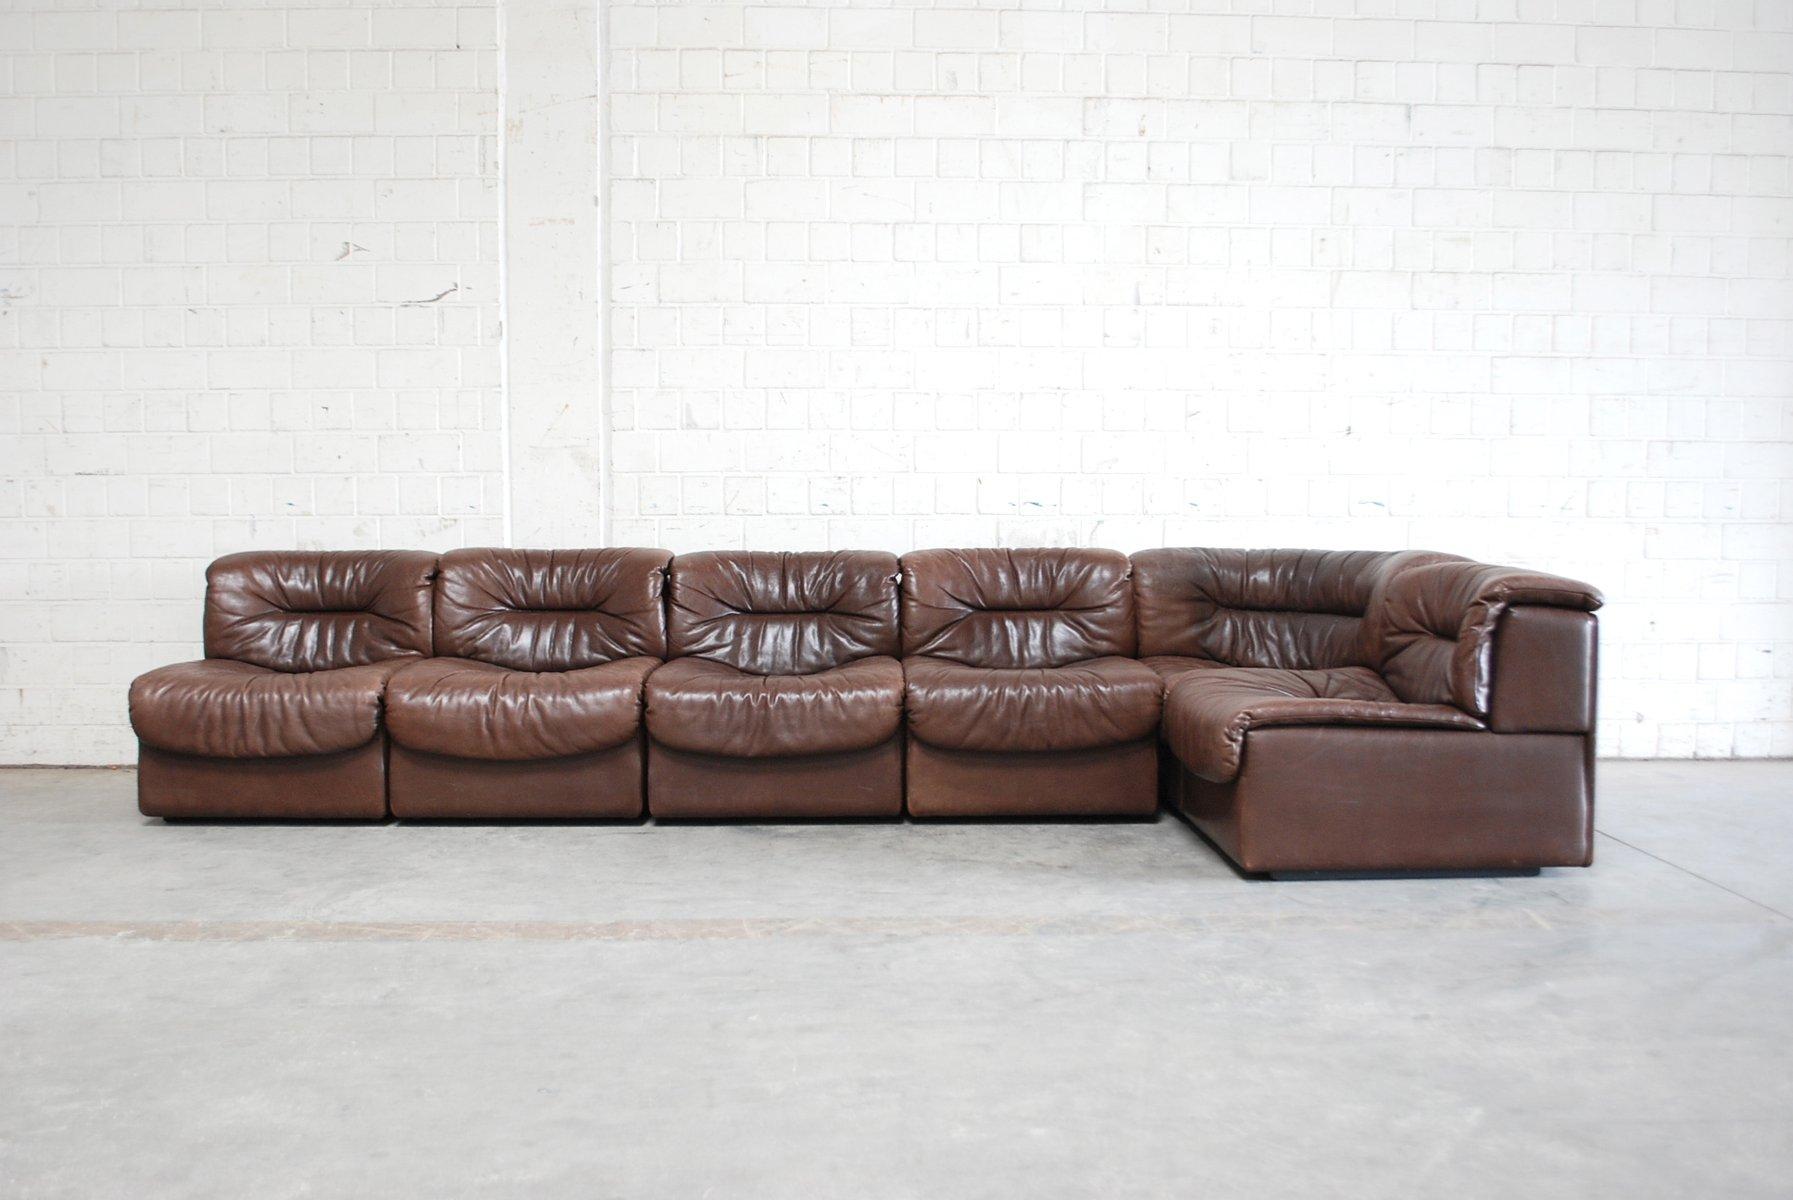 image sofa set 100 images forti modern 3 2 1 sofagarnitur